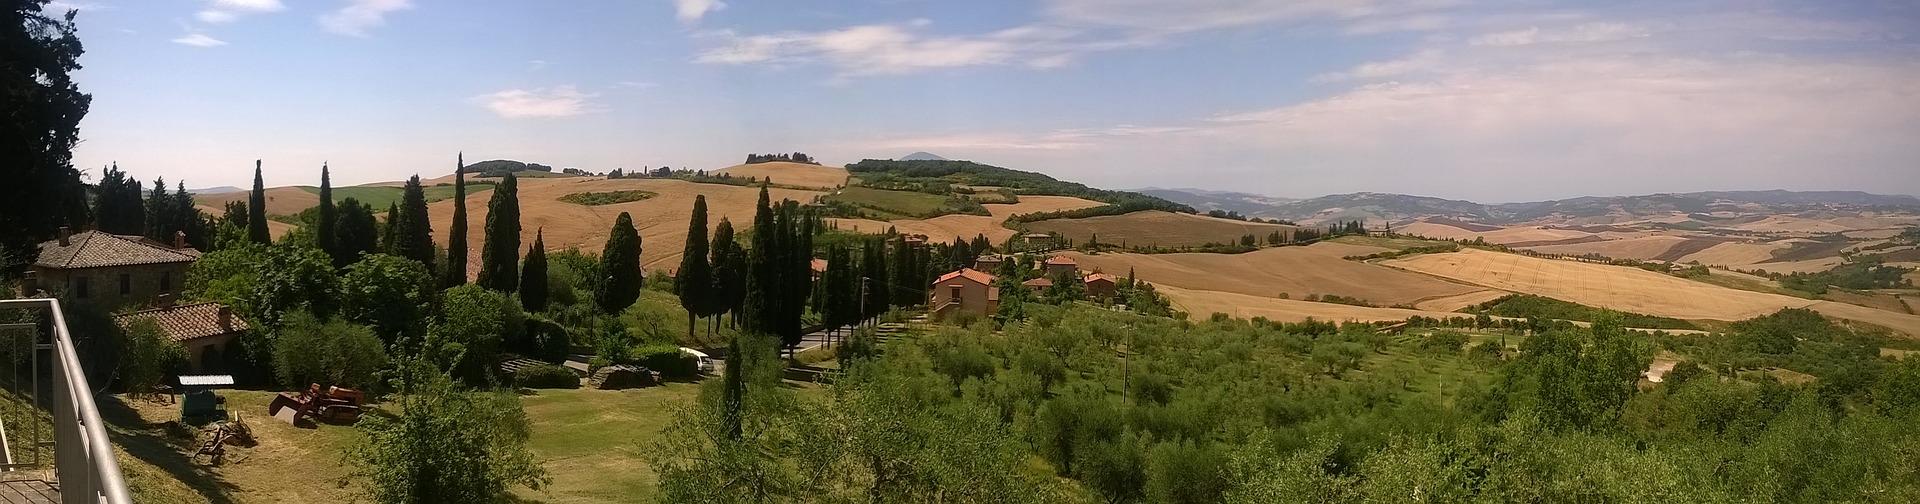 tuscany-2103587_1920.jpg